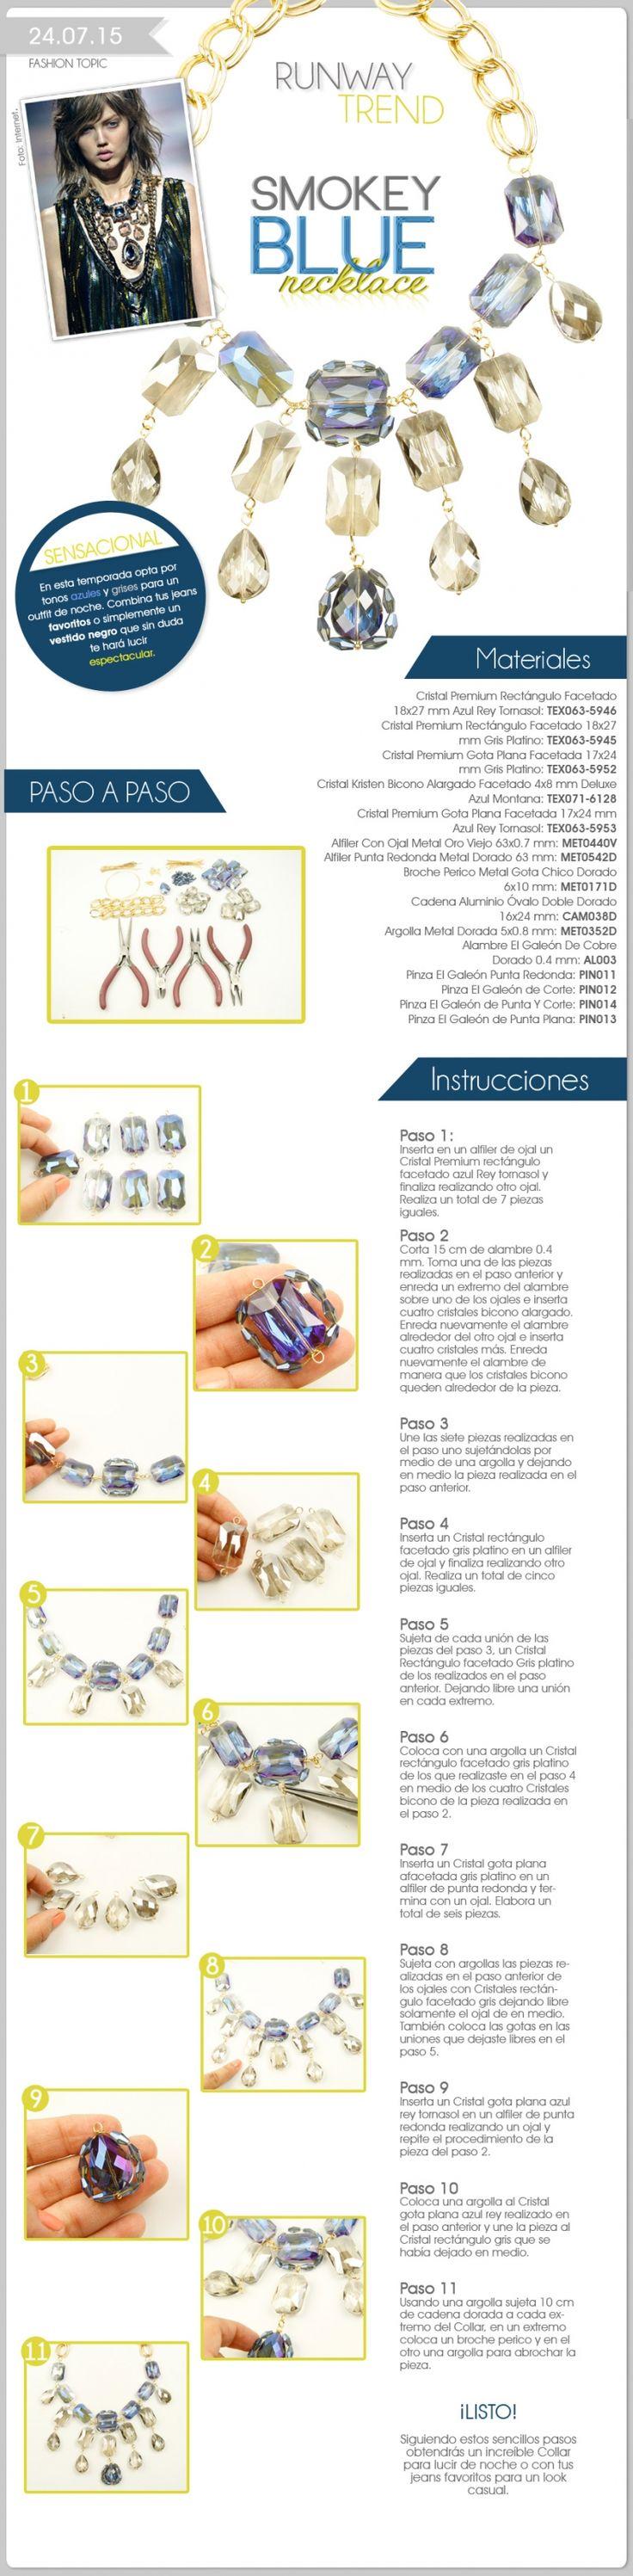 M s de 25 ideas incre bles sobre materiales para hacer for Proveedores de material para bisuteria